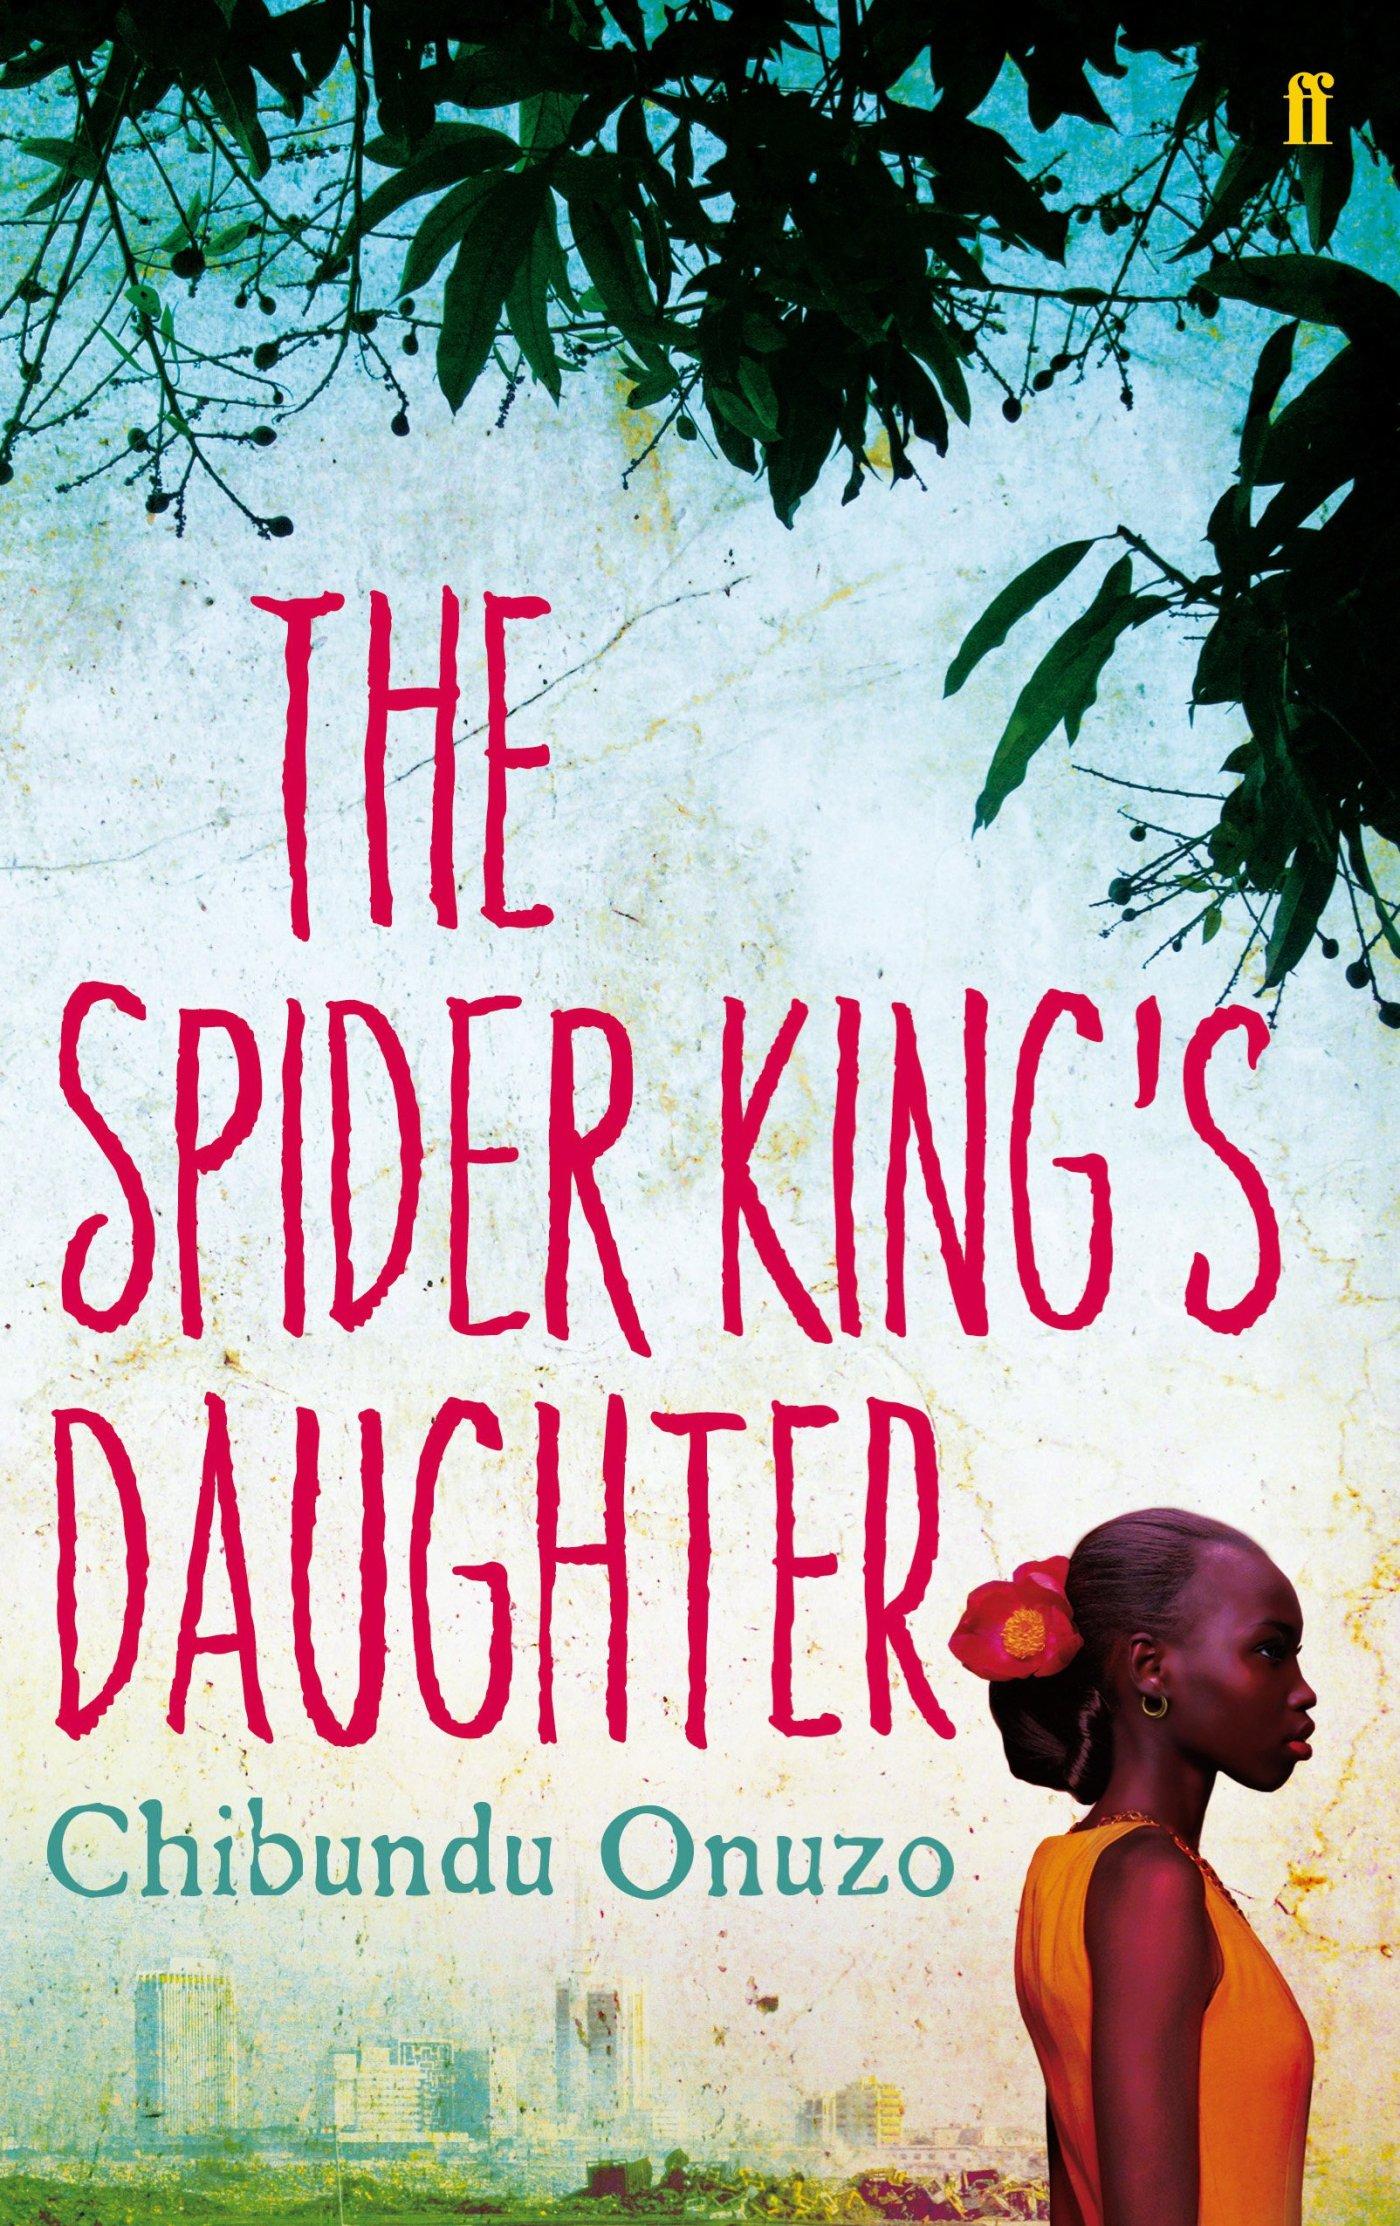 Spider King's Daughter: Onuzo, Chibundu: 9780571268894: Amazon.com ...